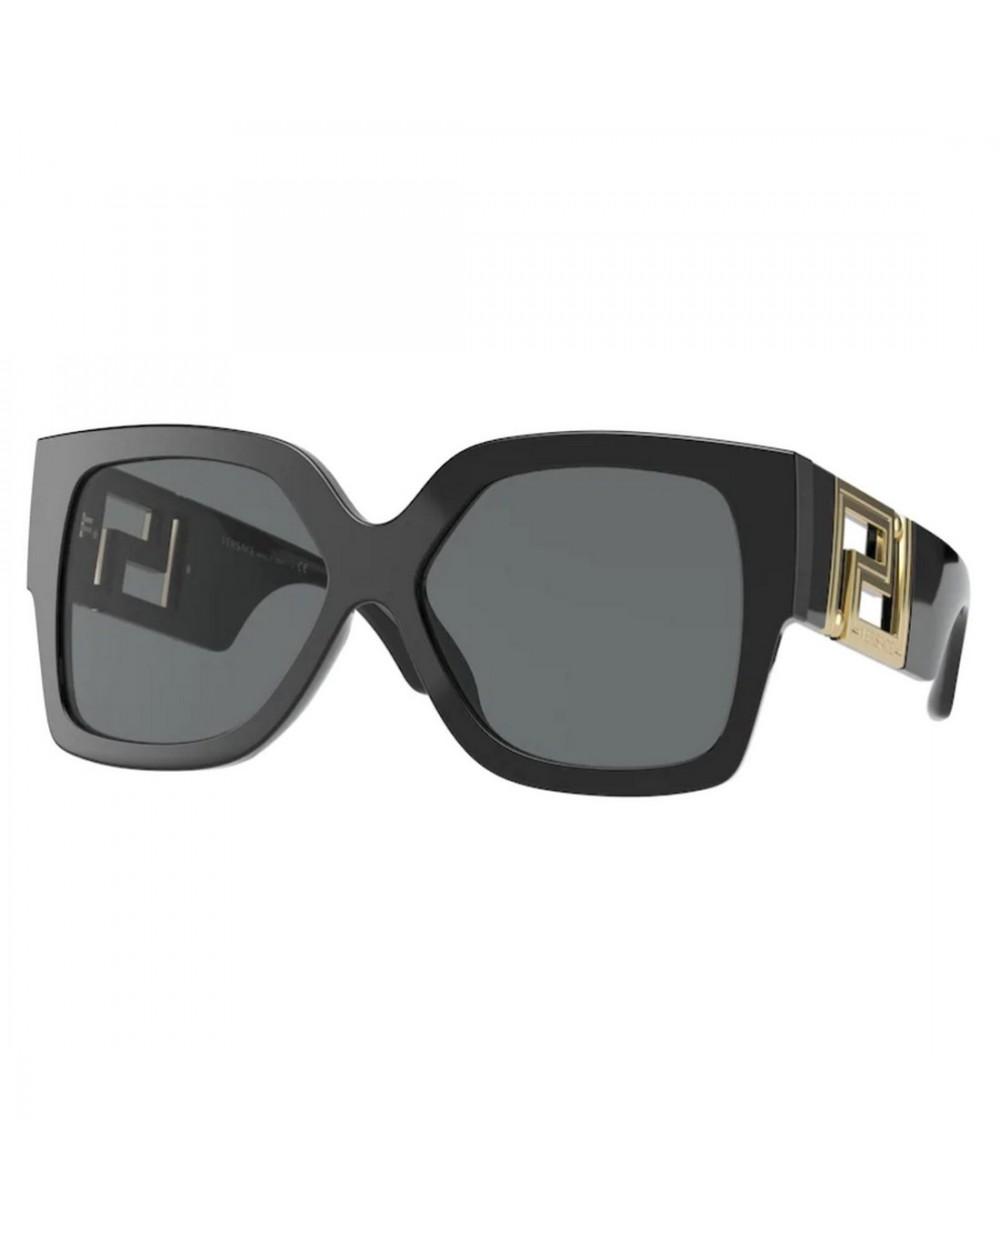 Occhiale da sole Versace VE 4402 originale garanzia italia